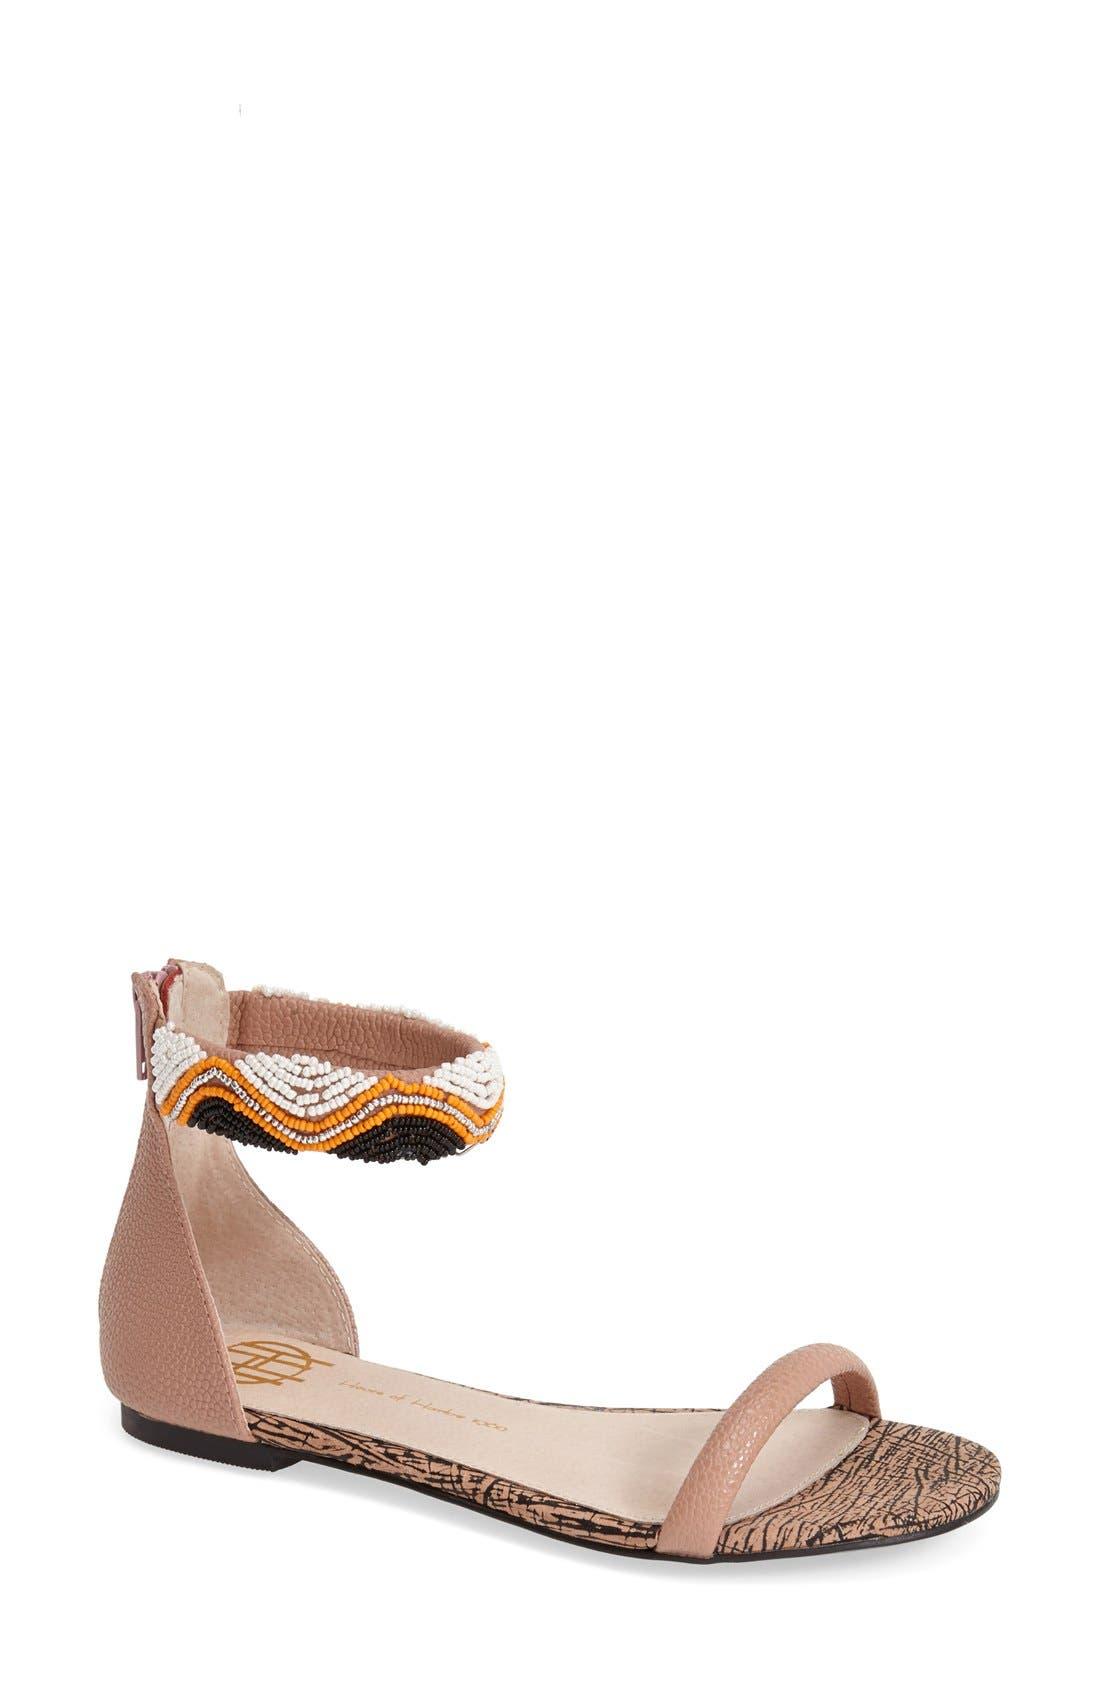 Main Image - House of Harlow 1960 Beaded Ankle Strap Sandal (Women)